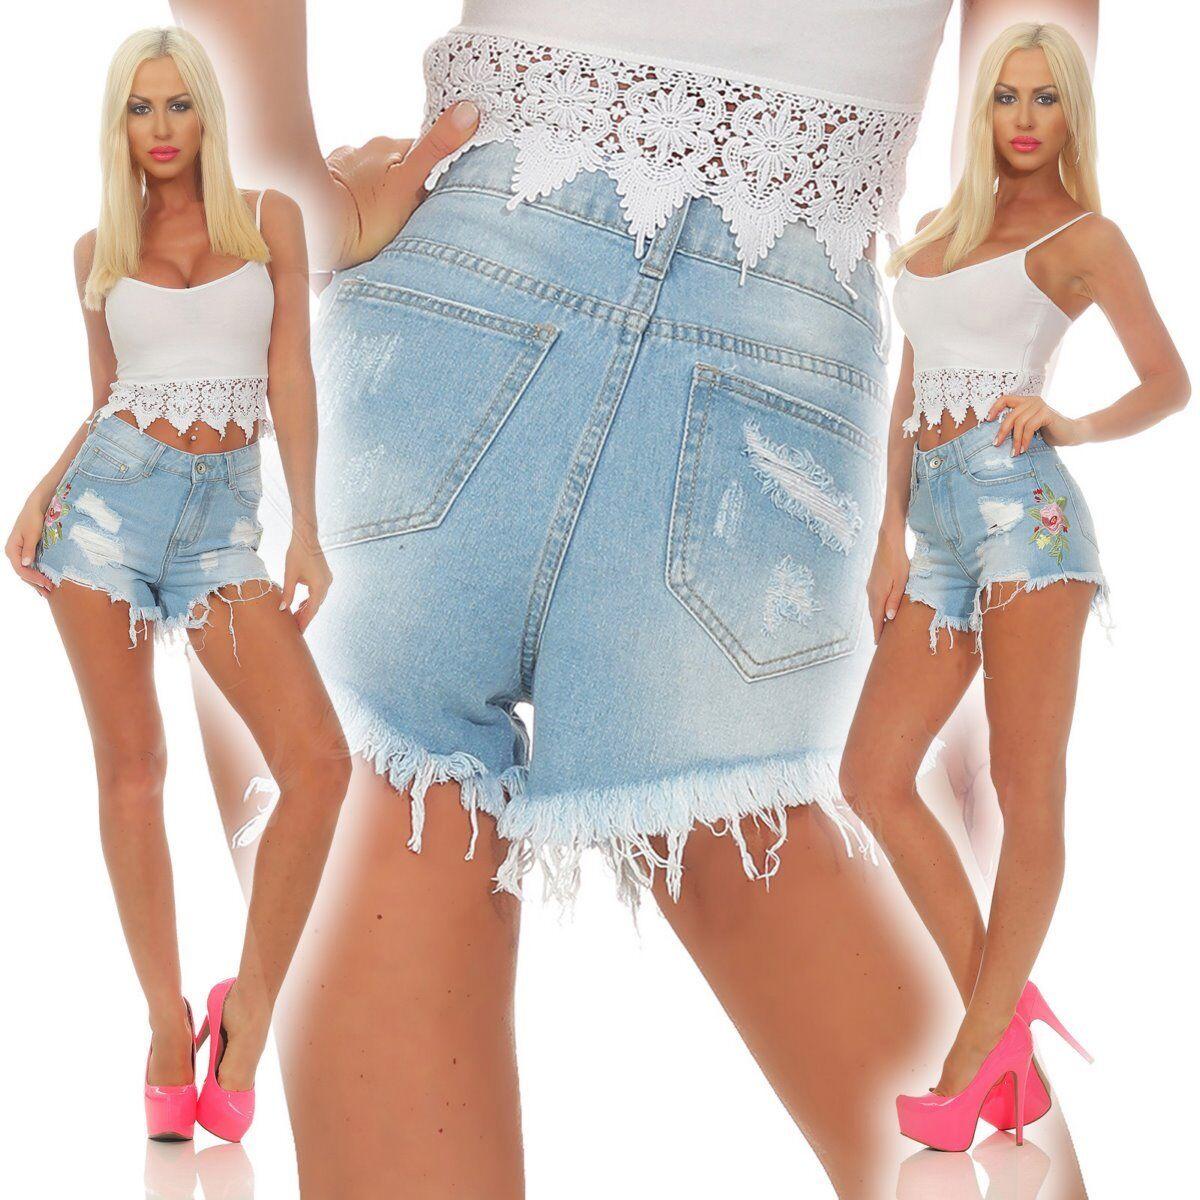 5287 Damen Jeans Hotpants Denim Shorts kurze Hose Hot Pants Jeans Fransen Rosen